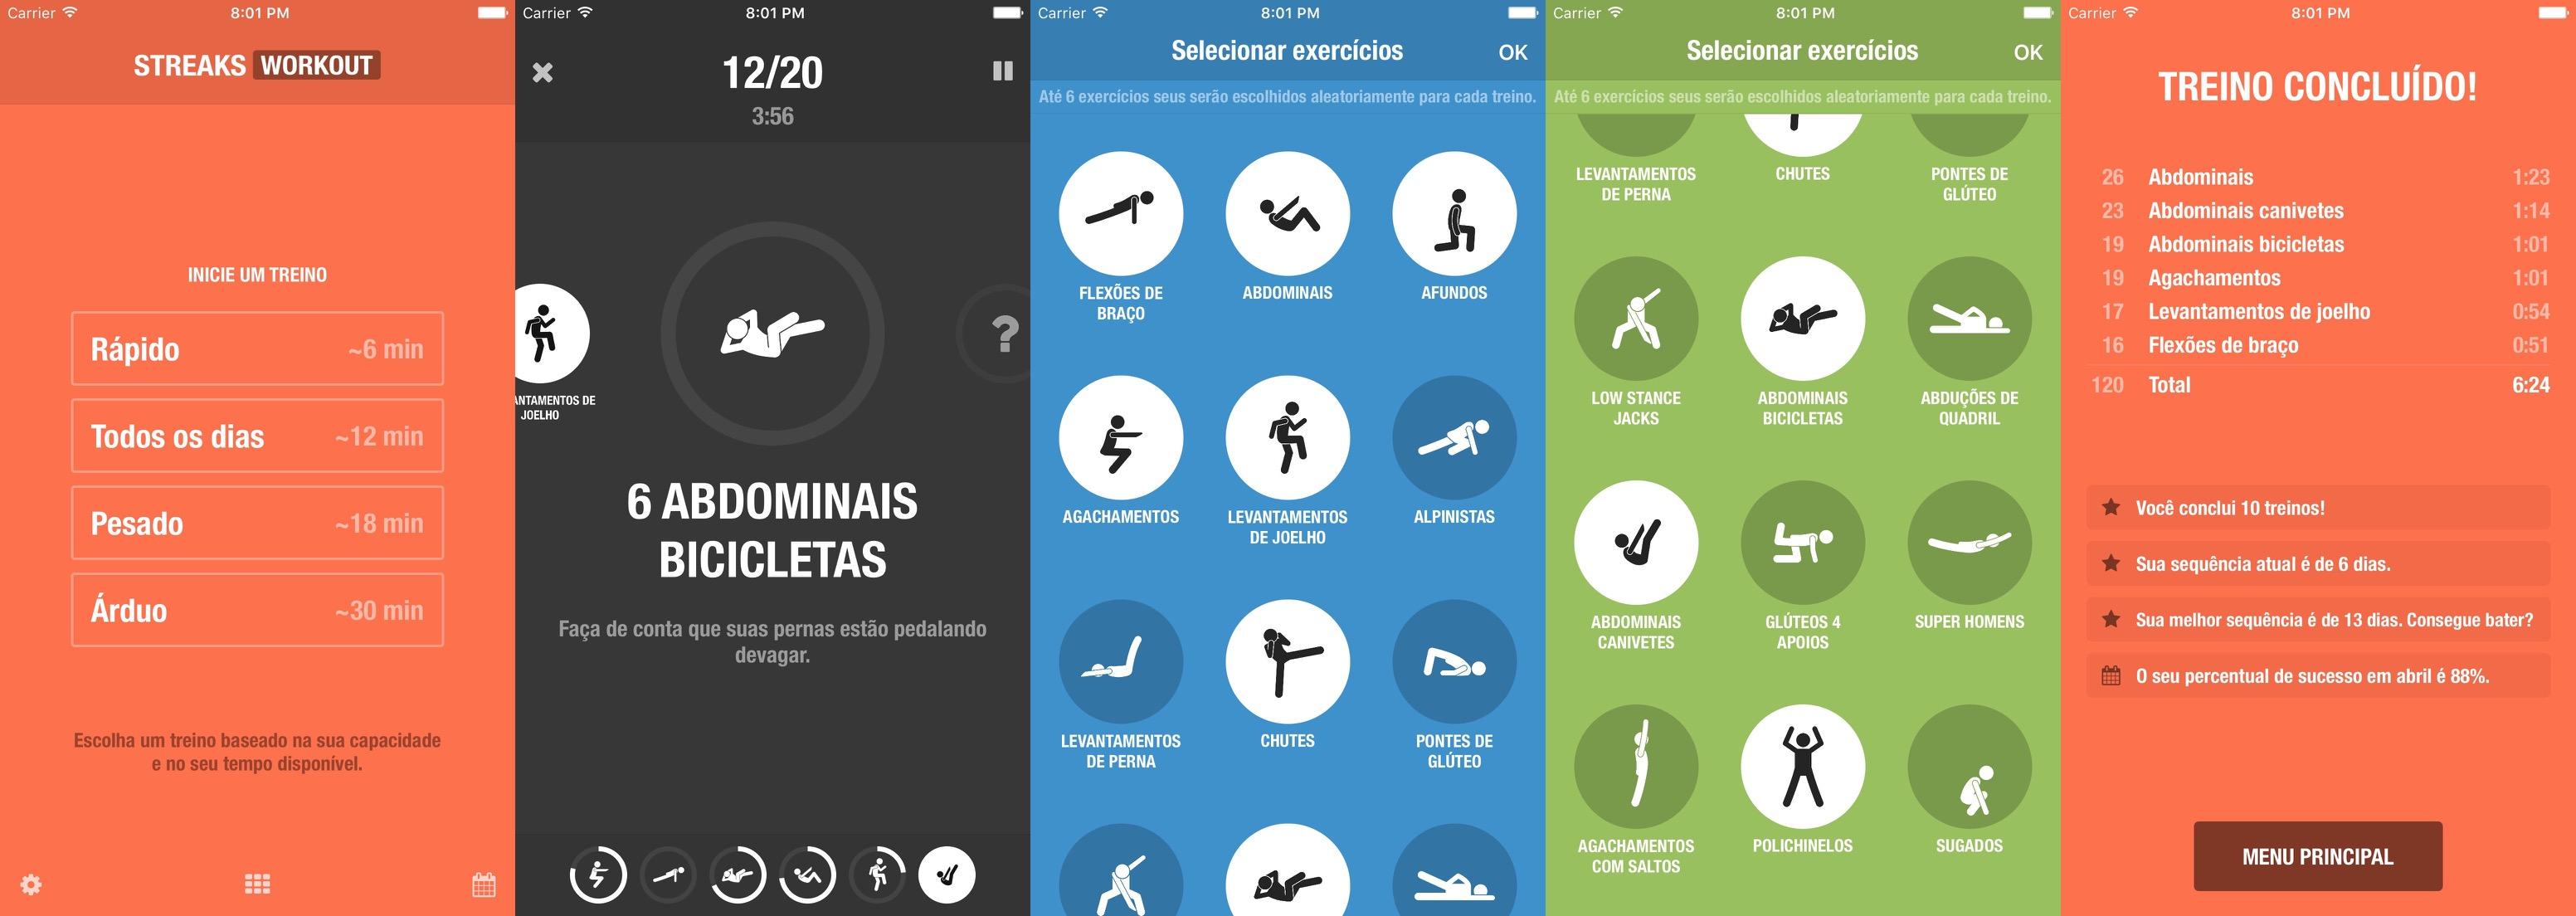 App Streaks Workout para iOS, watchOS e tvOS